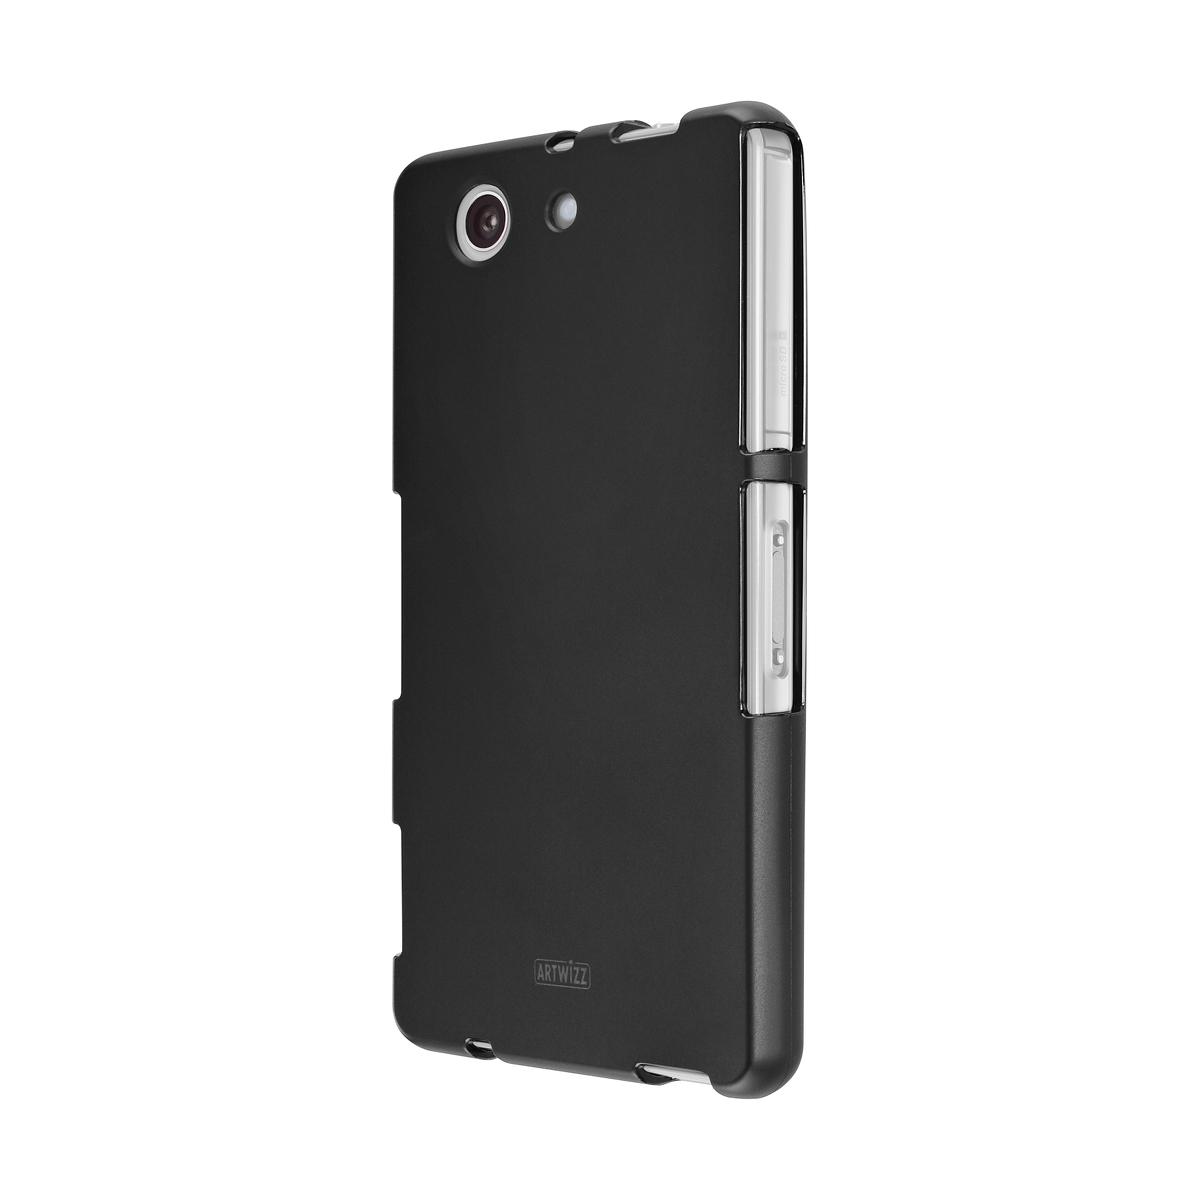 Xperia Z3 Compact Sony Seken Hlle Aus Elastischem Kunststoff Fr